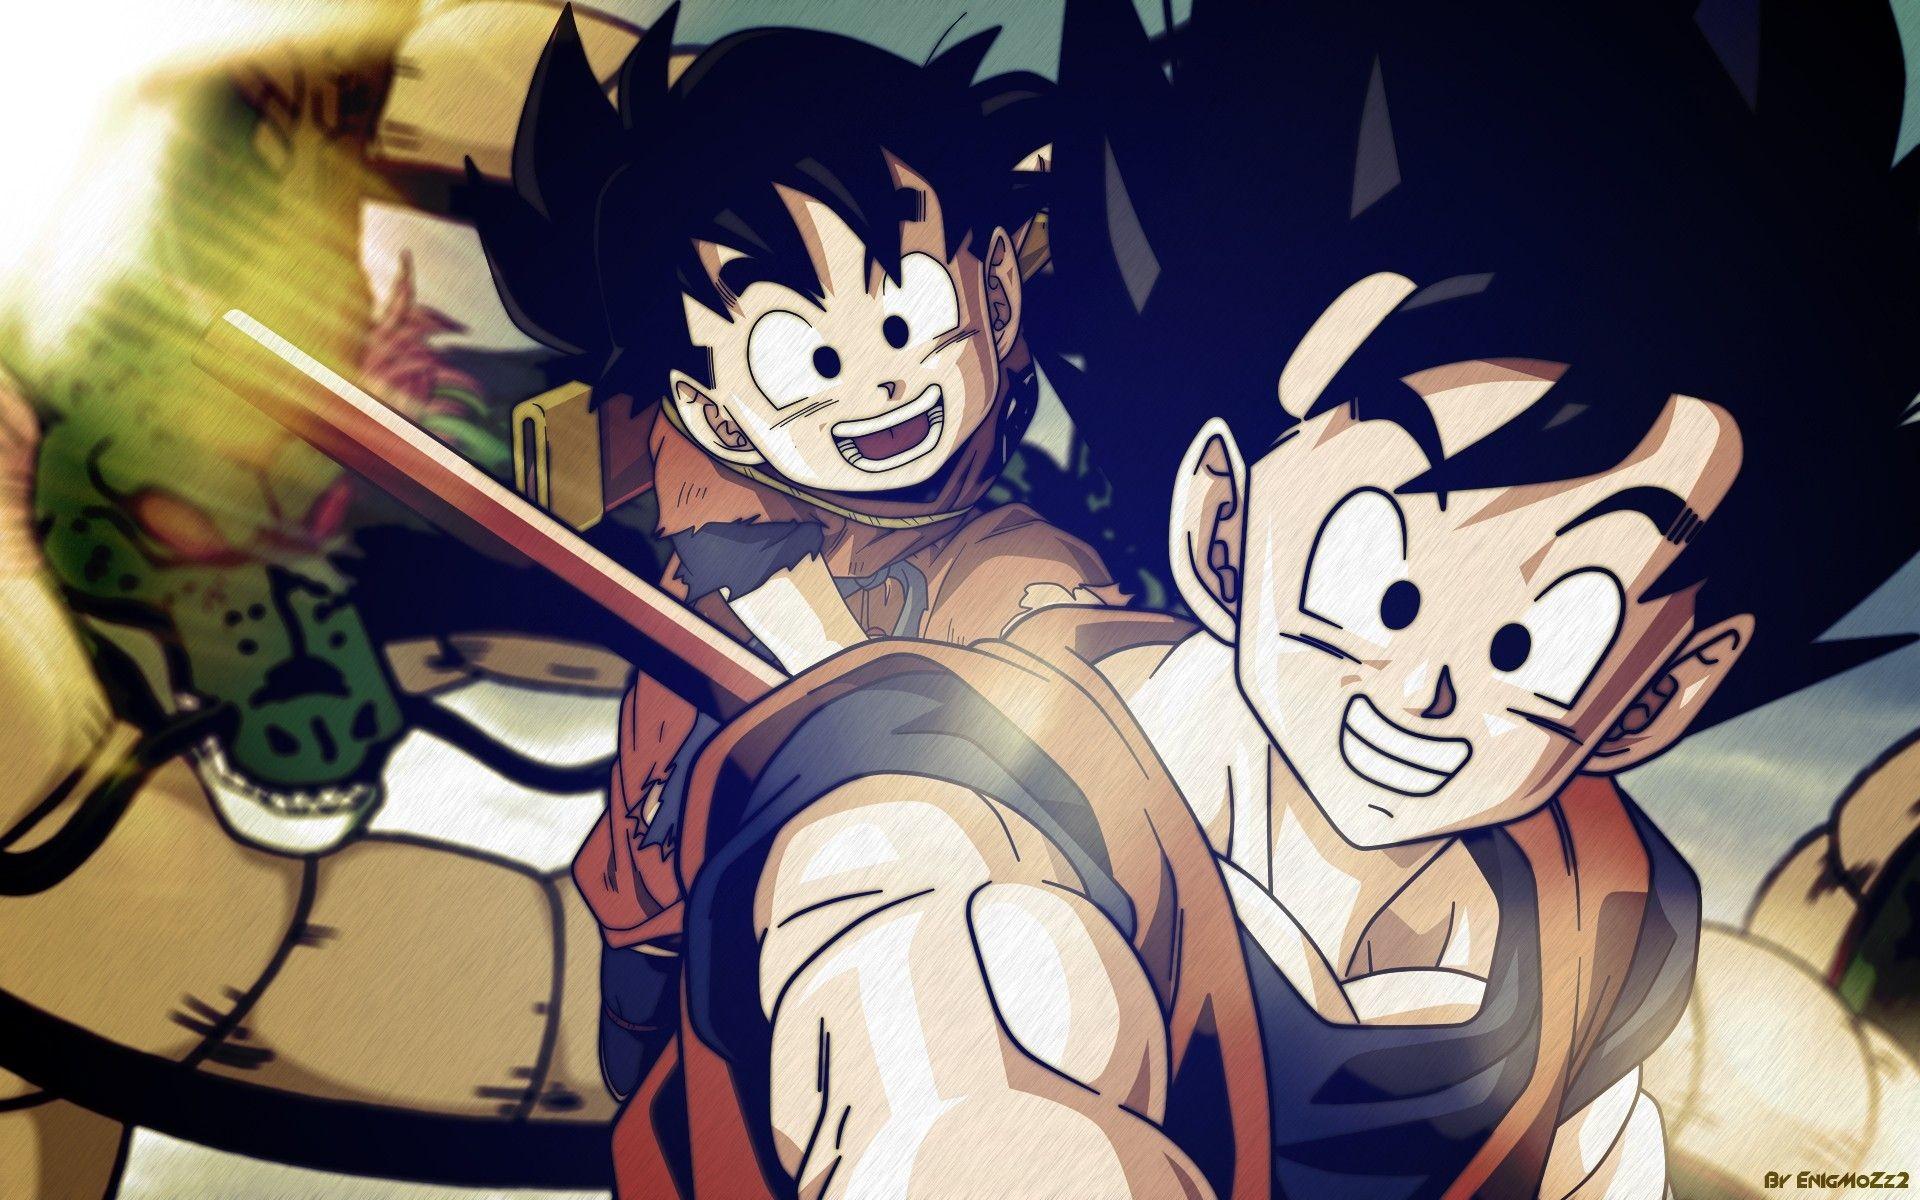 Res: 1920x1200, Dragon Ball Z Goku Gohan Wallpaper HD #4451 Wallpaper .